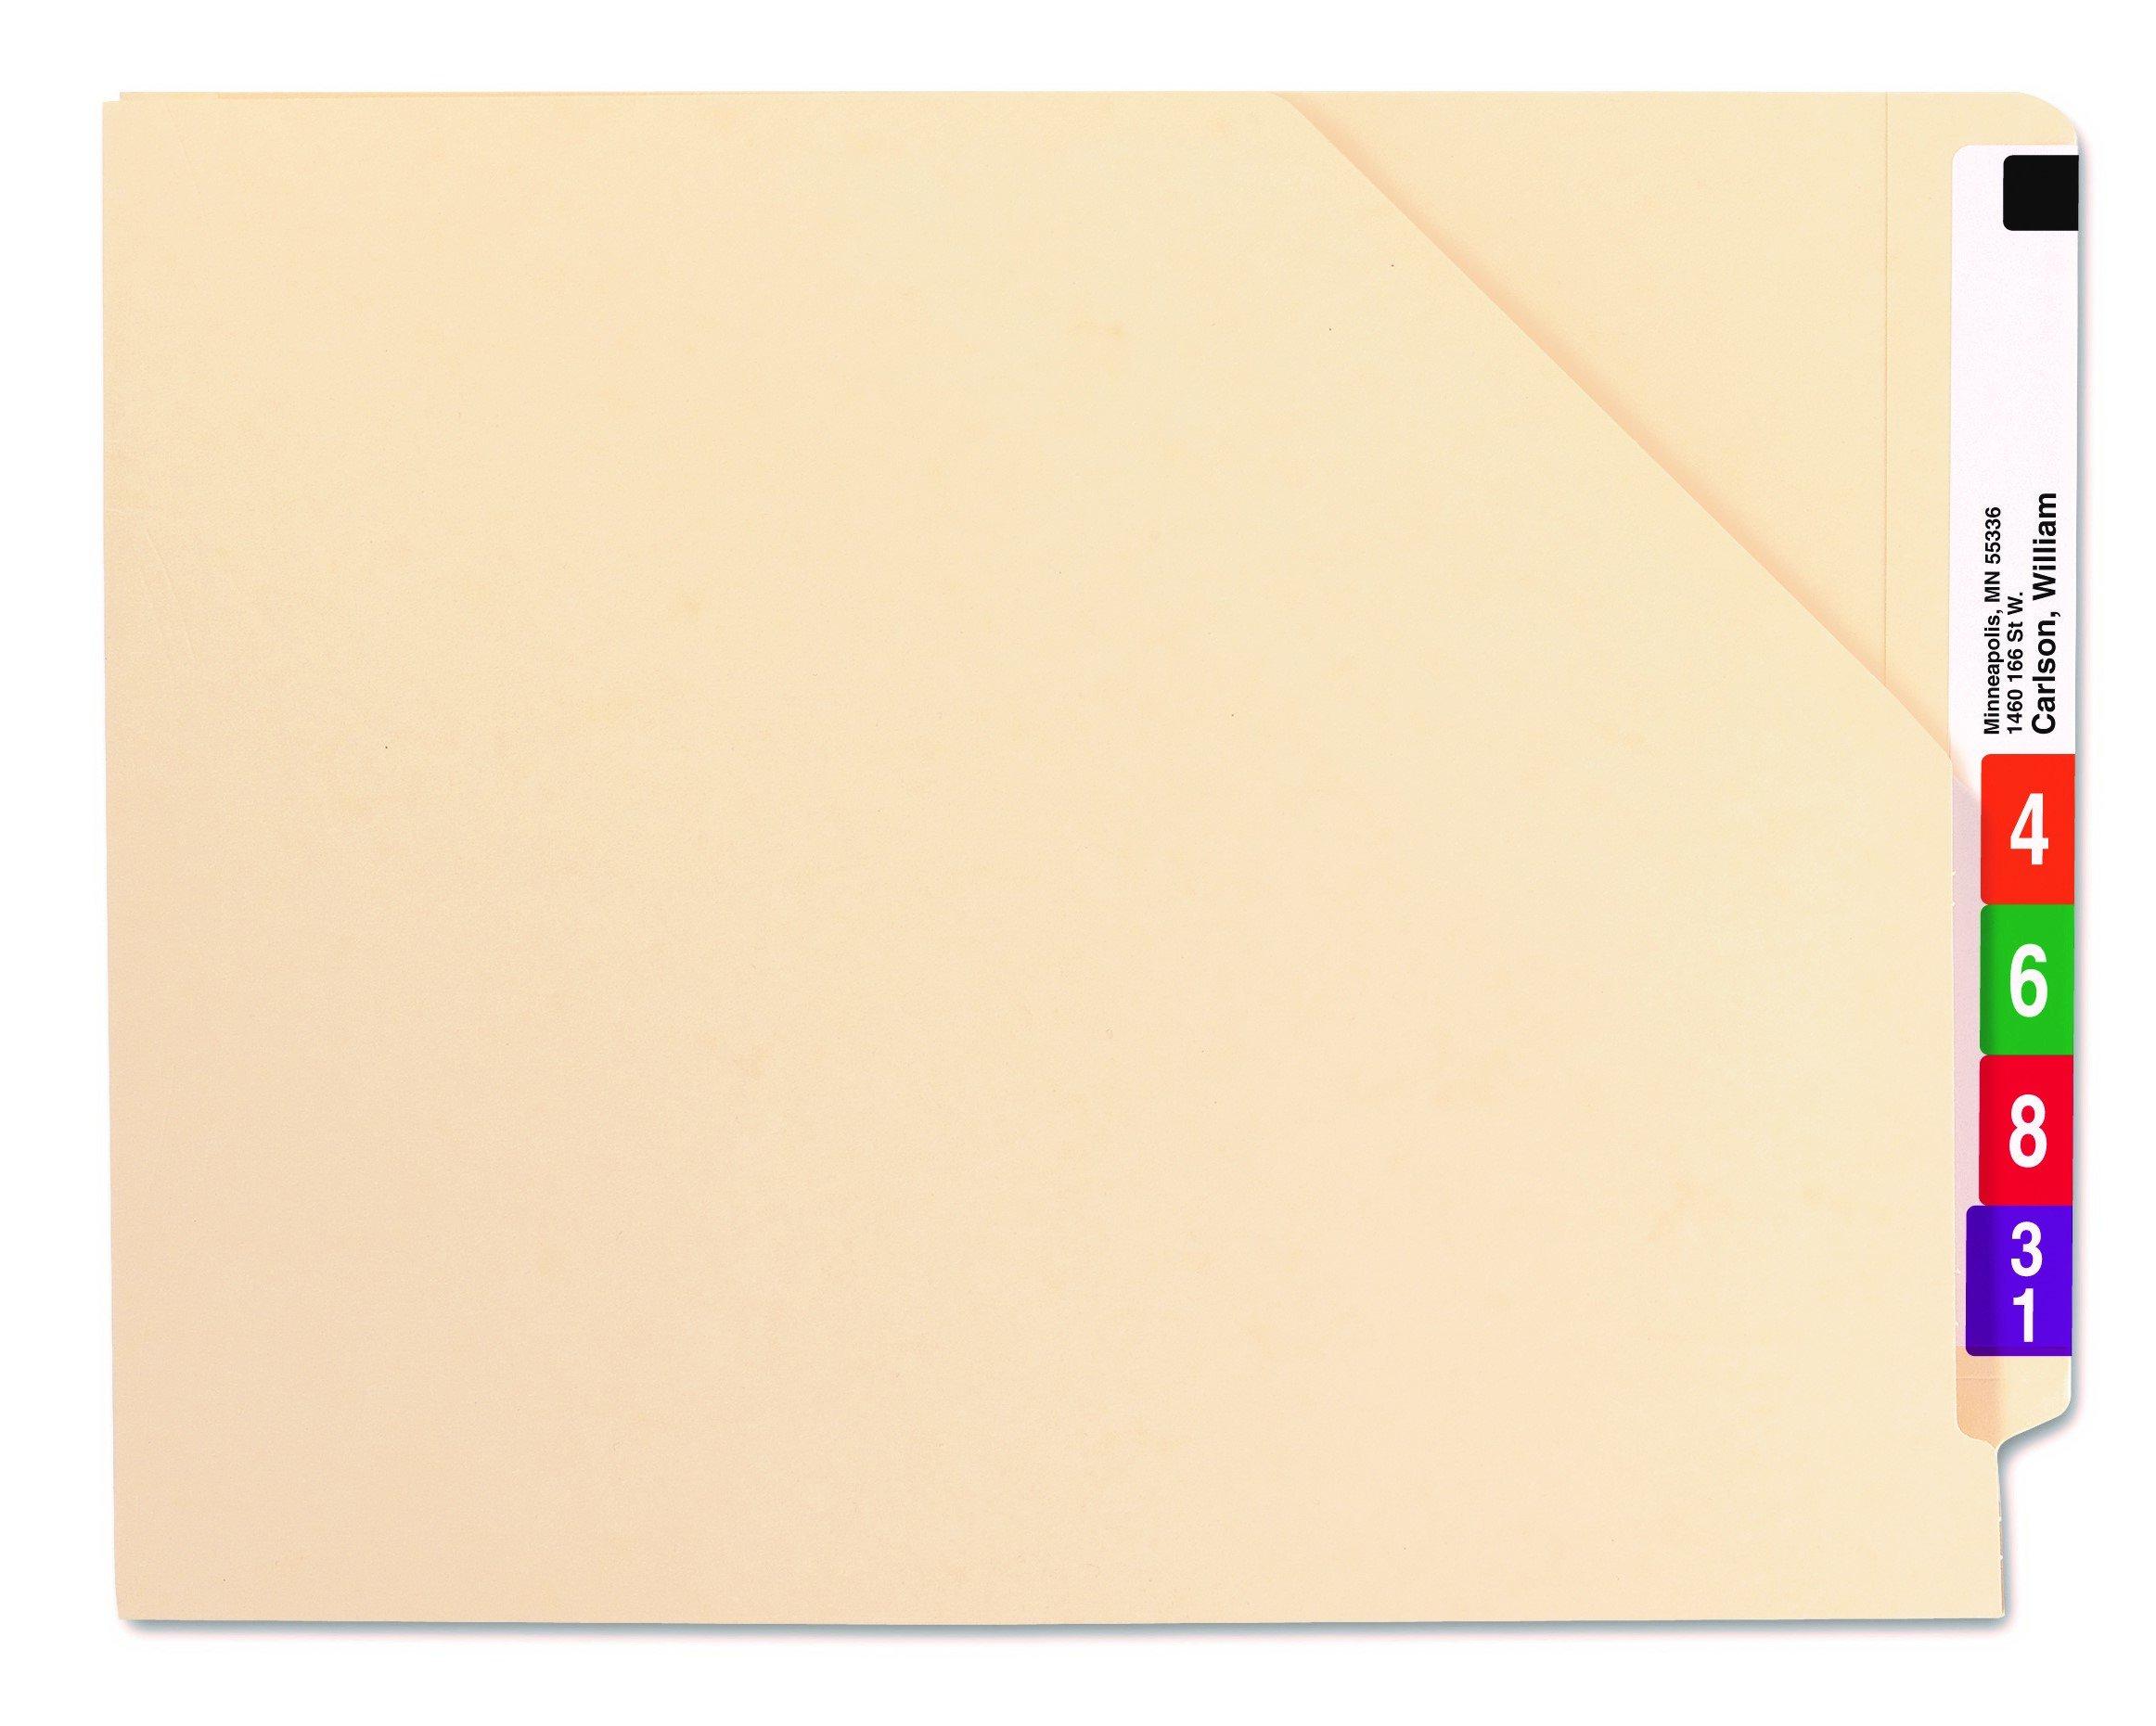 Smead End Tab File Jacket, Shelf-Master Reinforced Straight-Cut Tab, Letter Size, Manila, 100 per Box (75700) by Smead